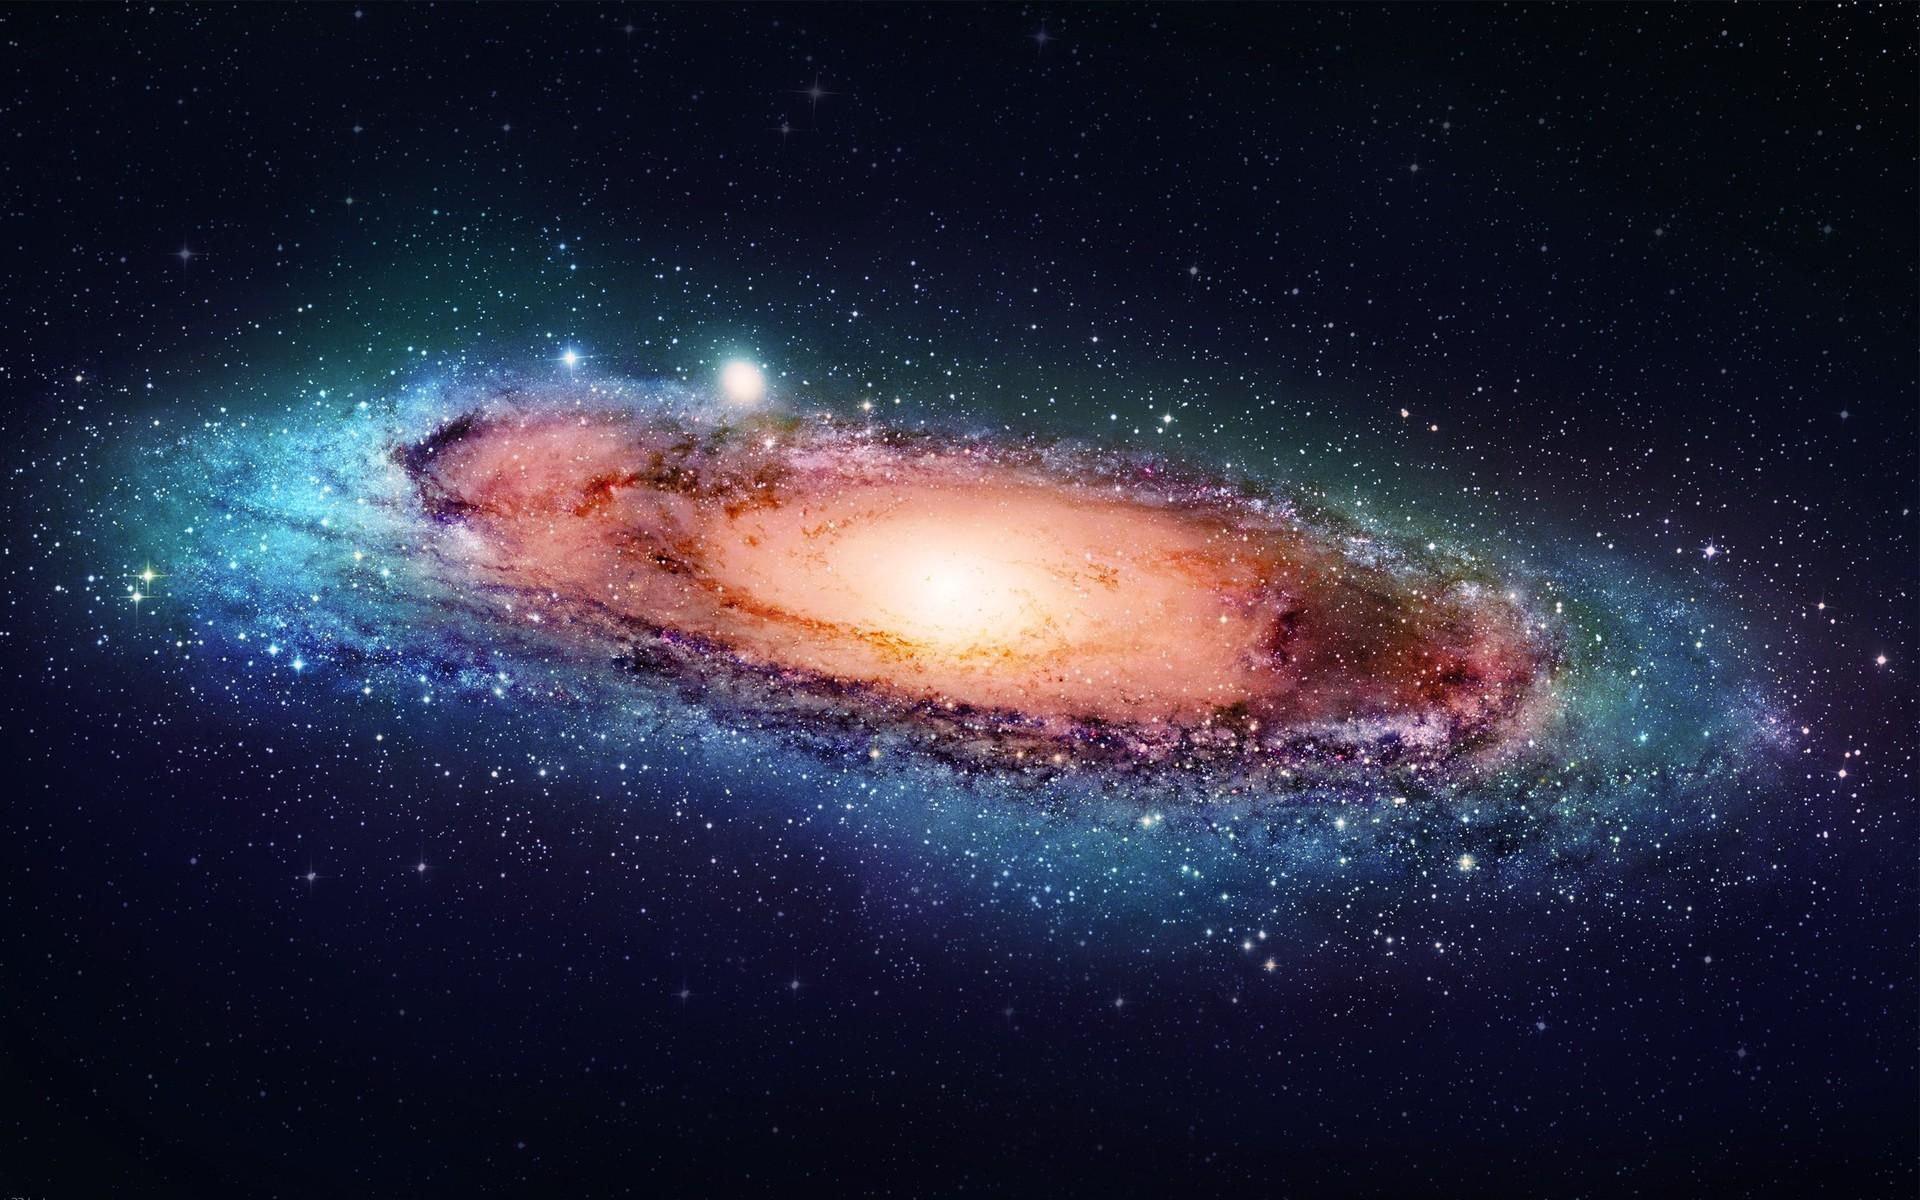 46 Andromeda Galaxy Wallpaper On Wallpapersafari